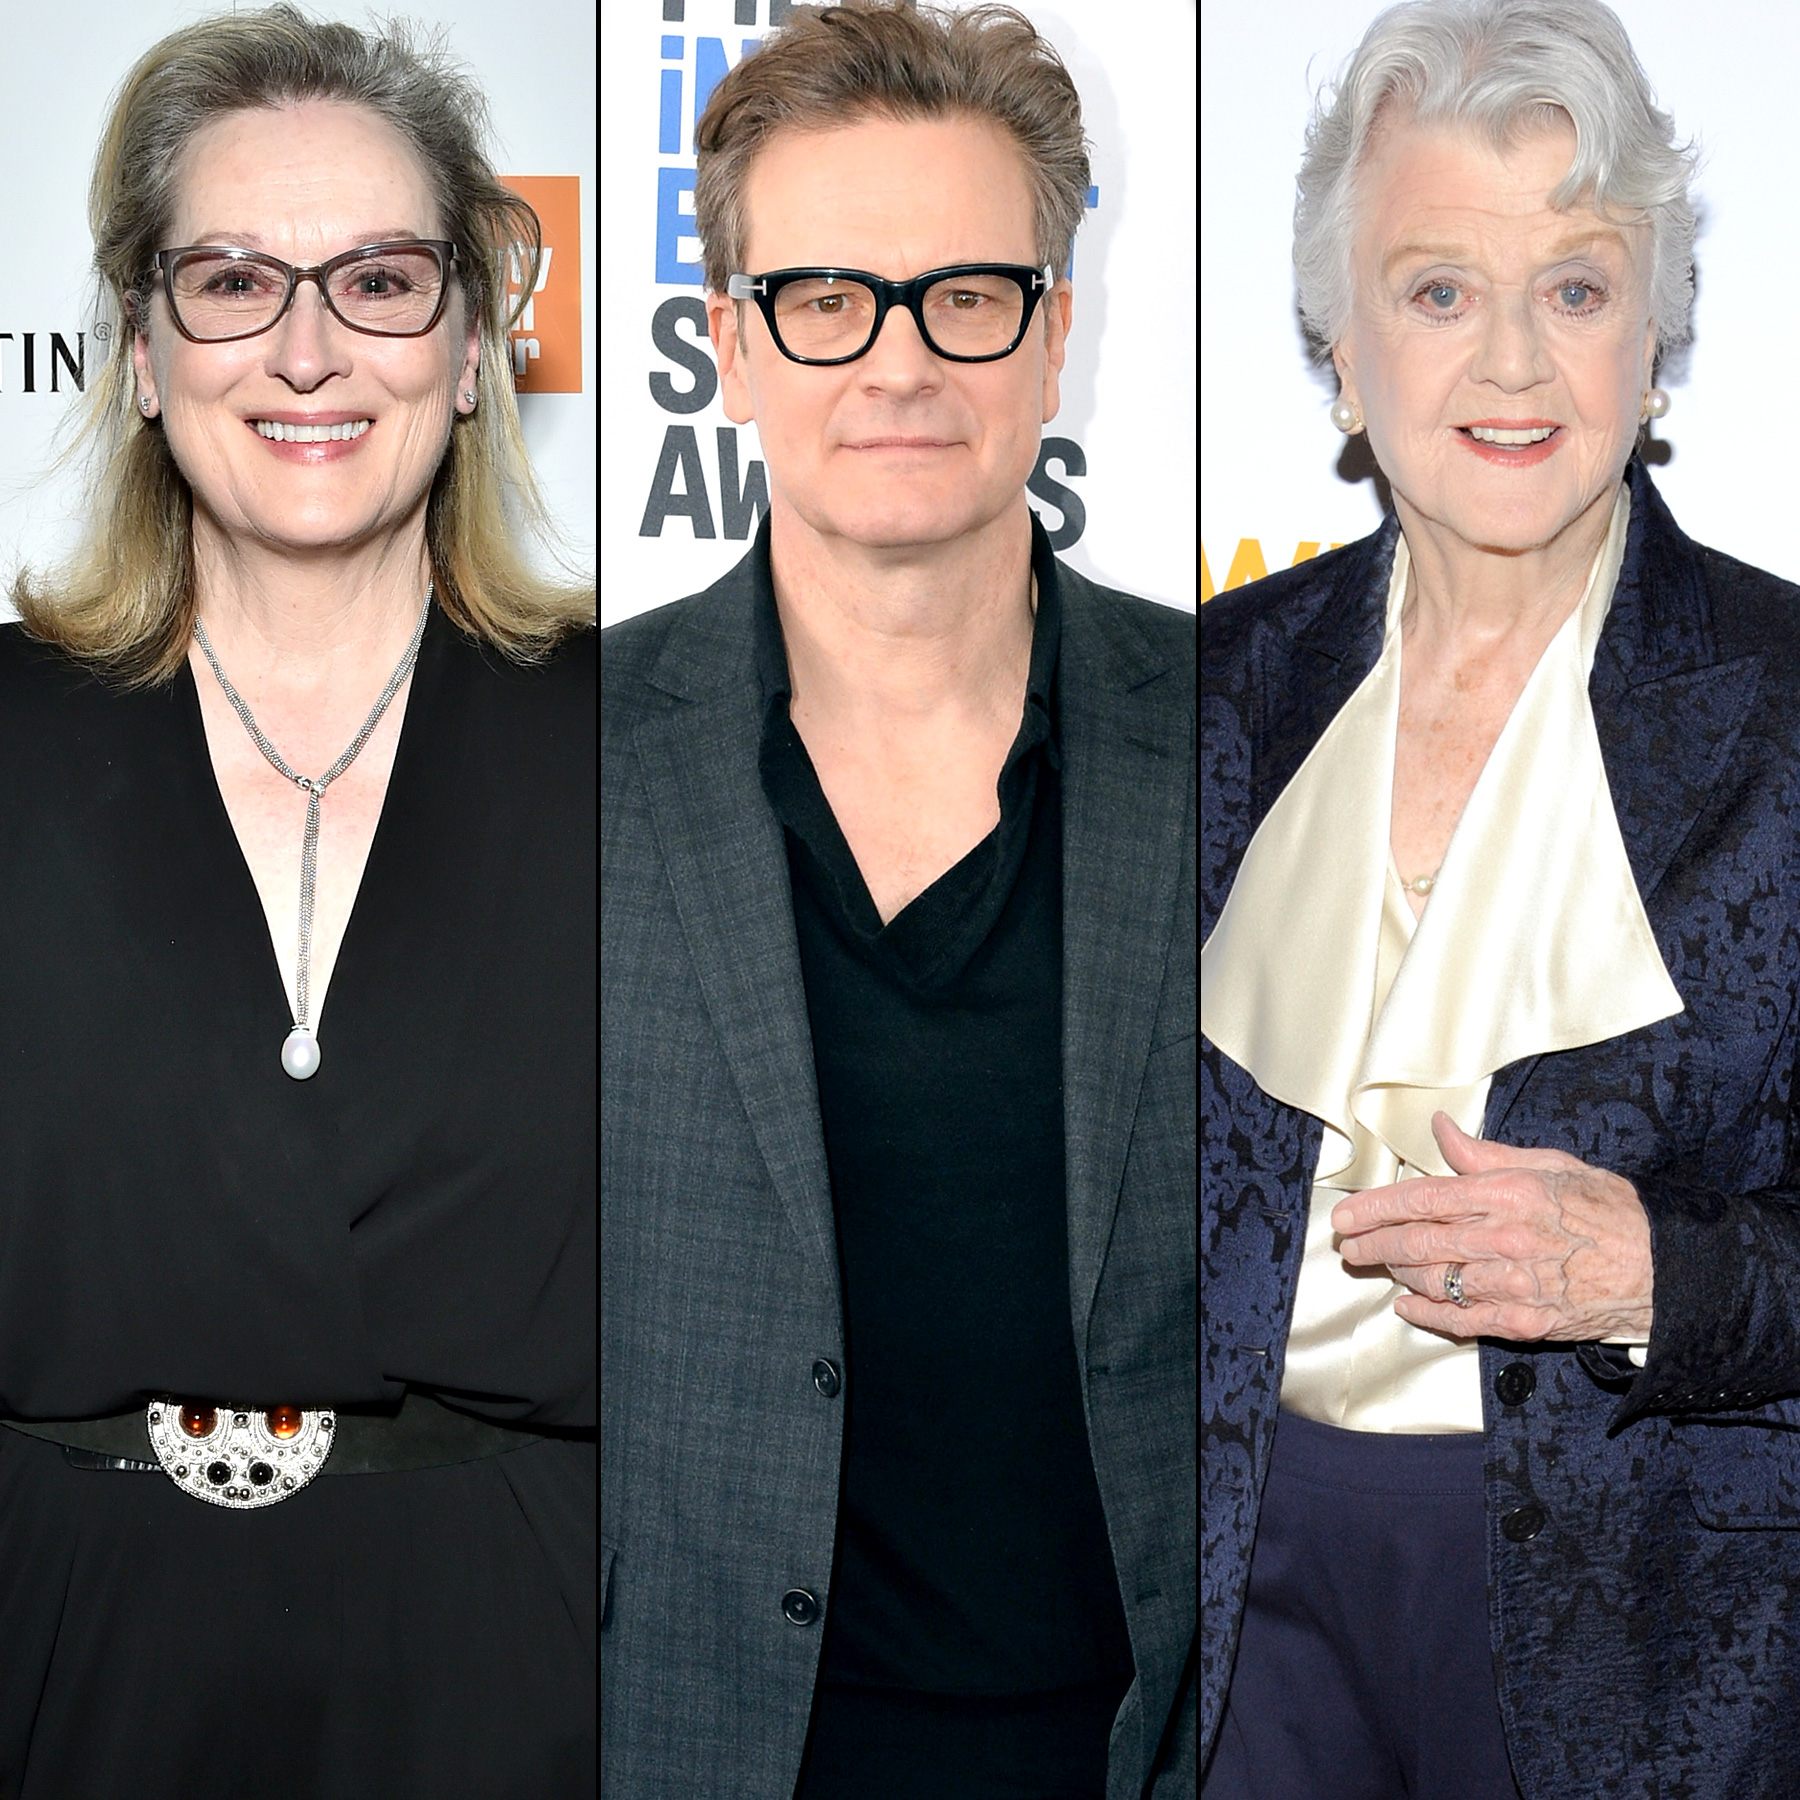 Meryl Streep, Colin Firth, and Angela Lansbury